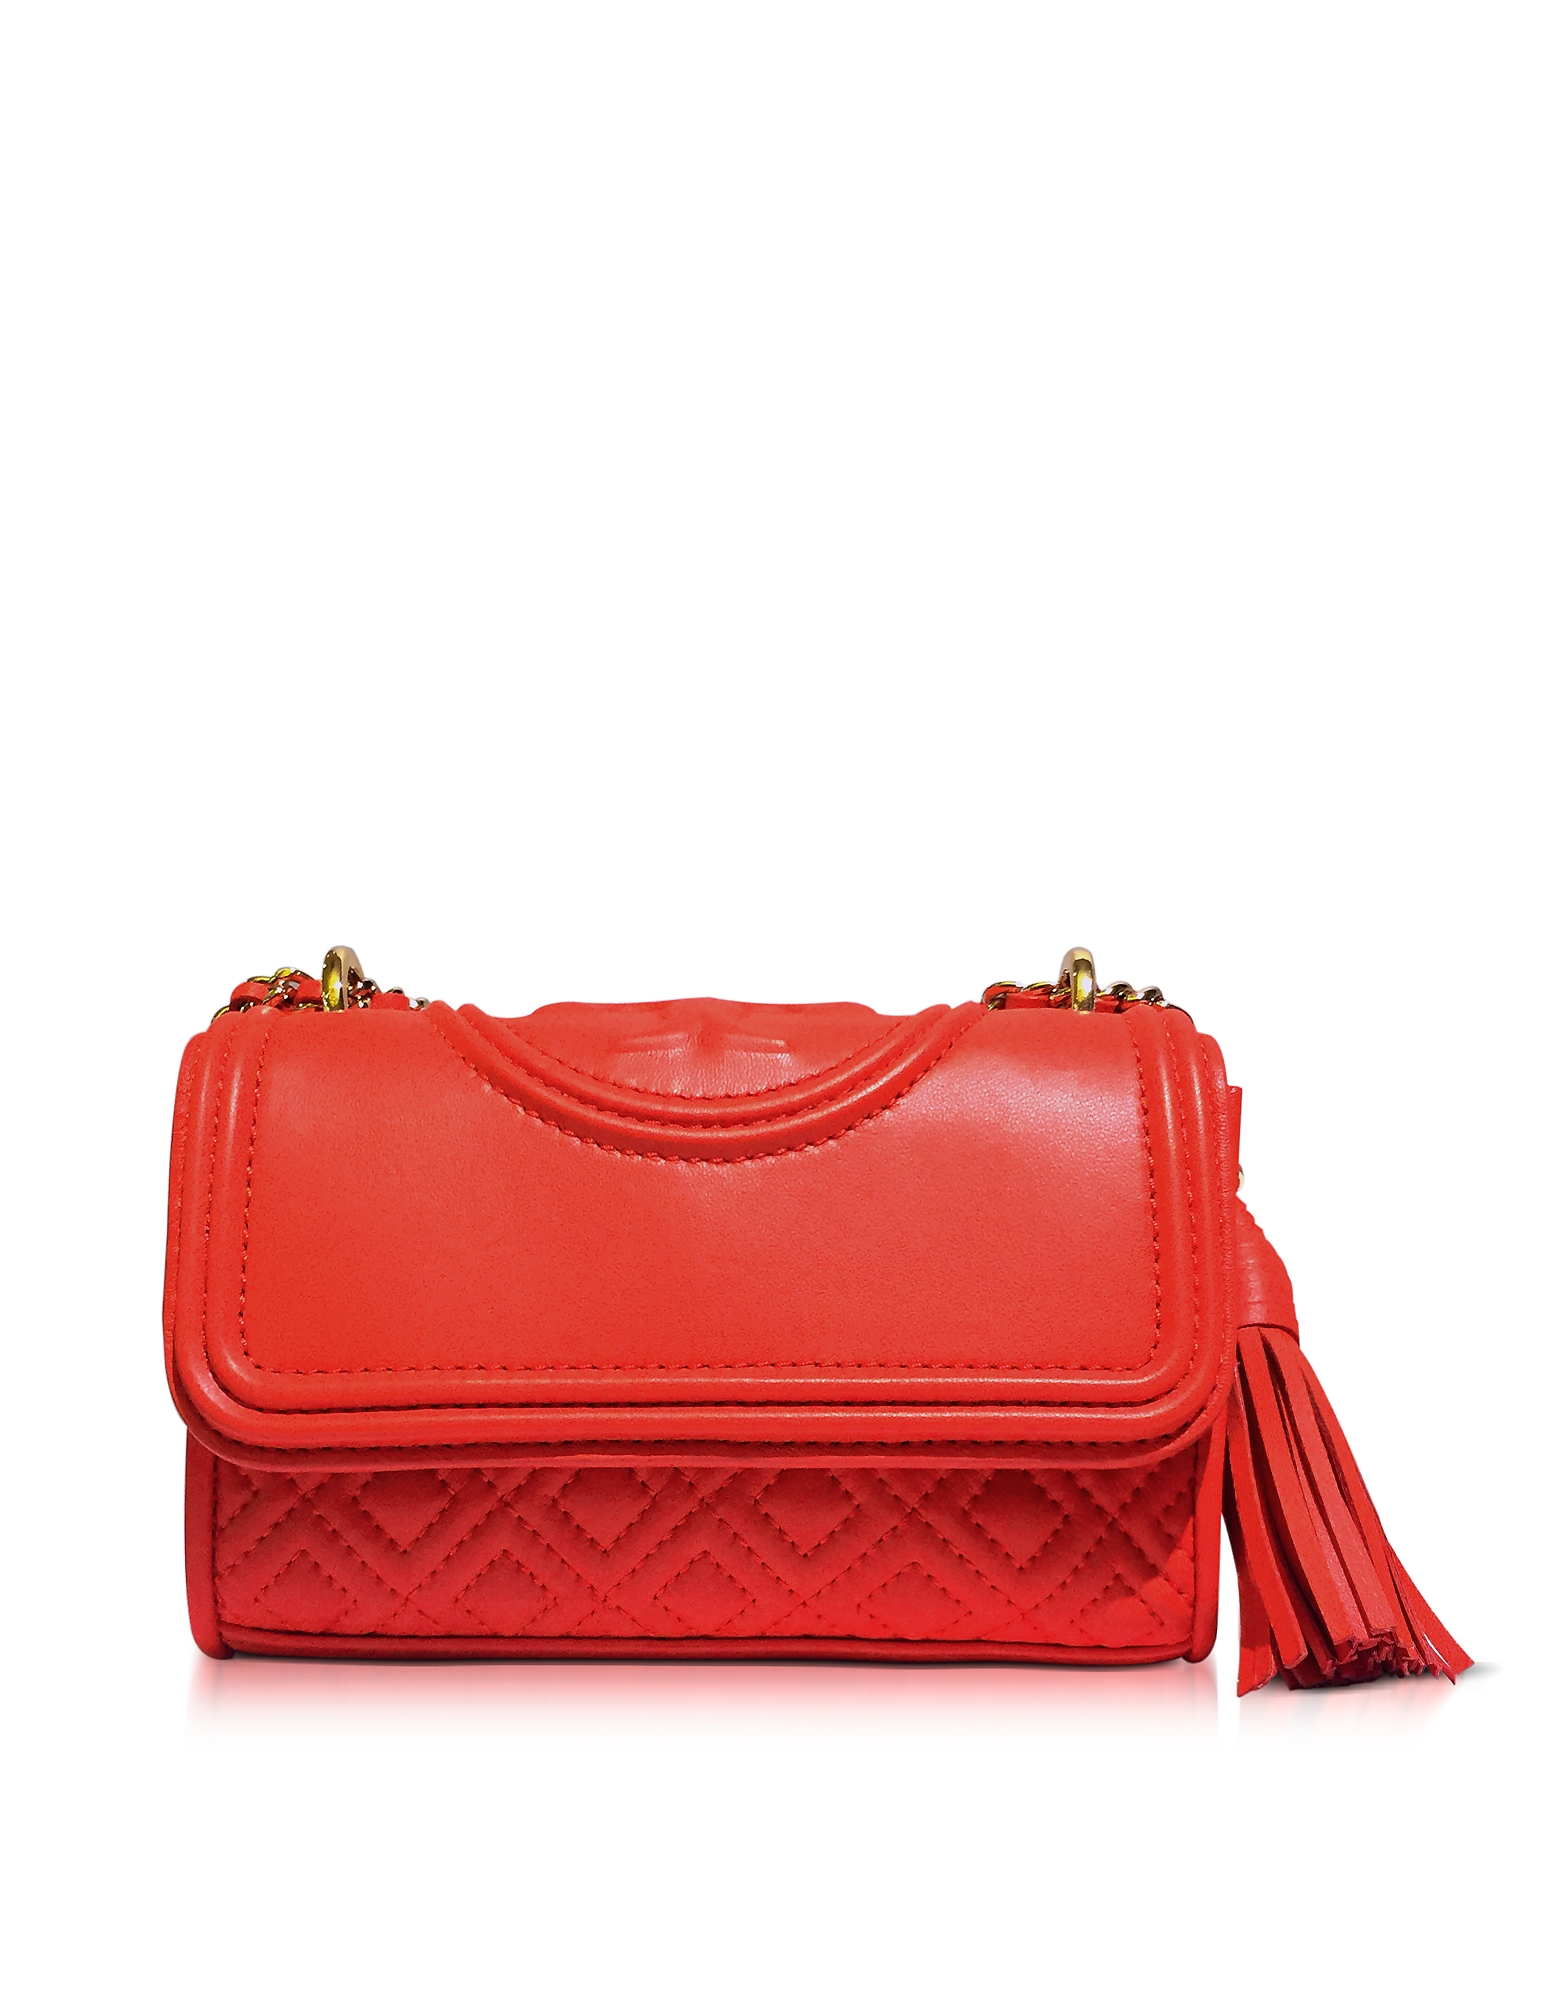 Tory Burch Handbags, Fleming Red Volcano Leather Micro Shoulder Bag